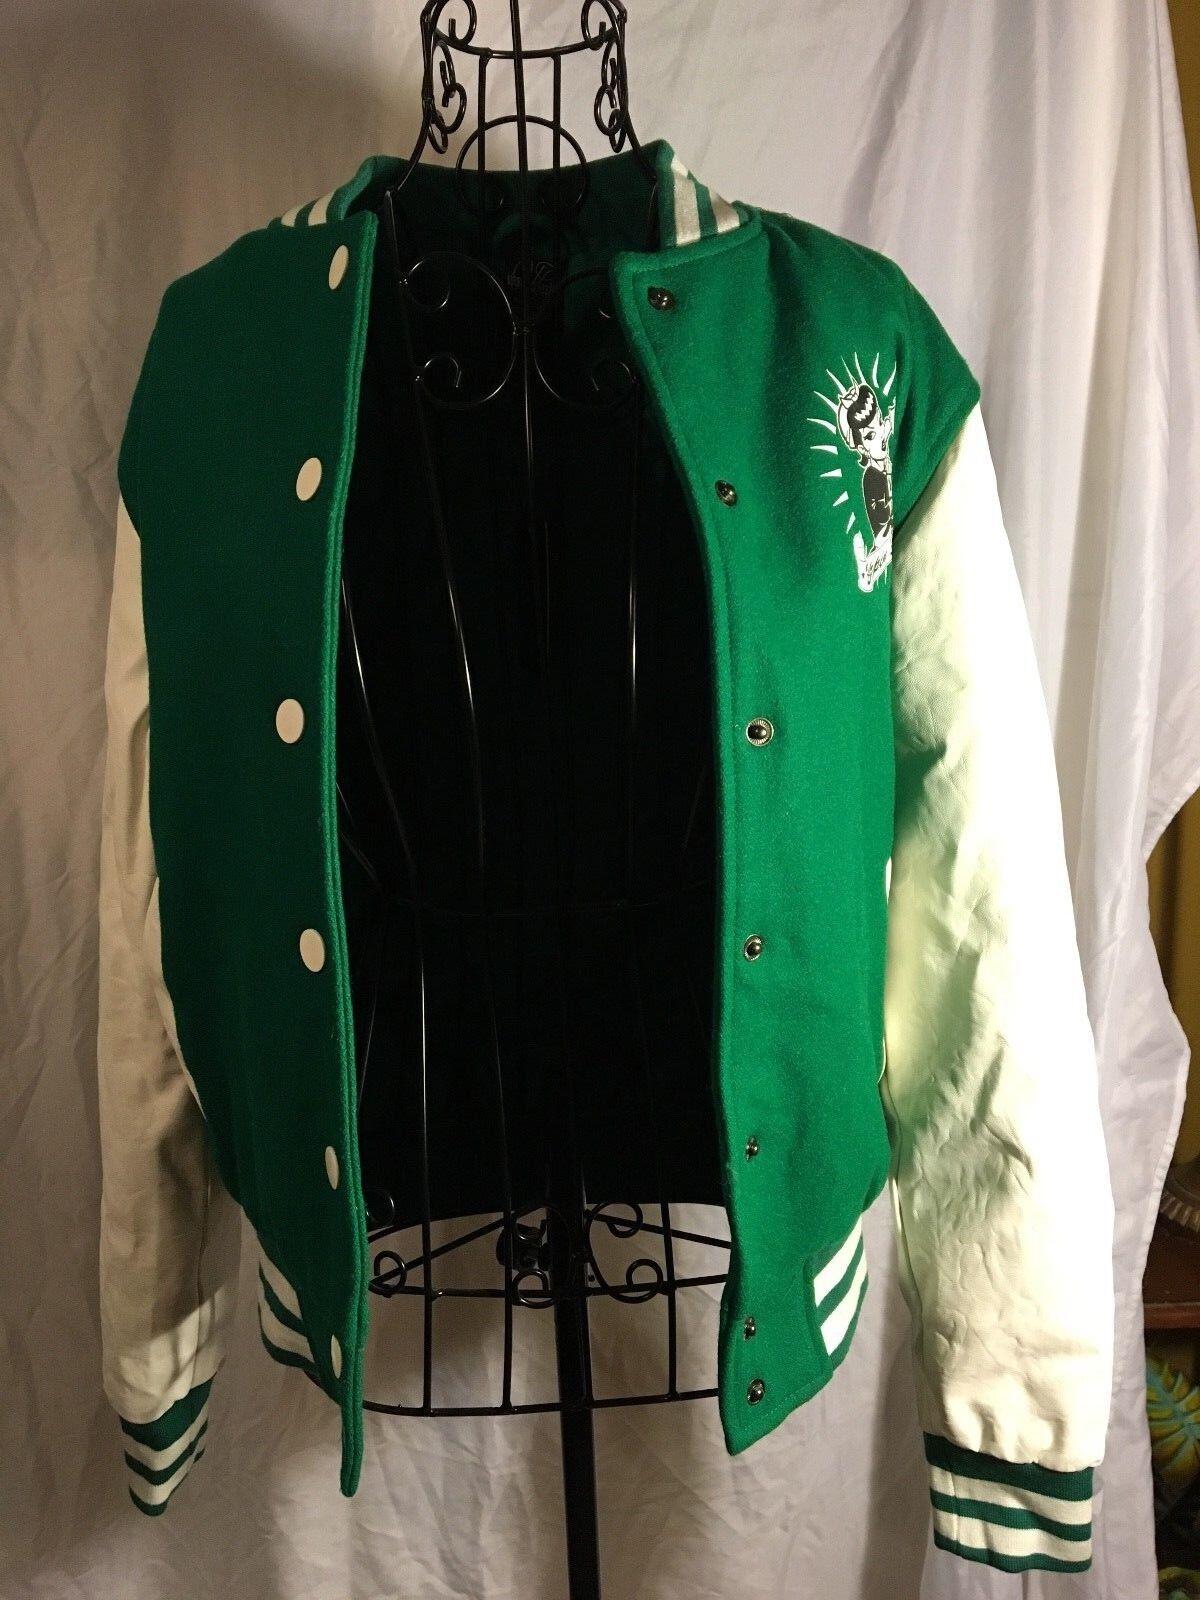 Купить Urban Classics - NWT Teen girl's Urban Classics old school jacket green and white size medium